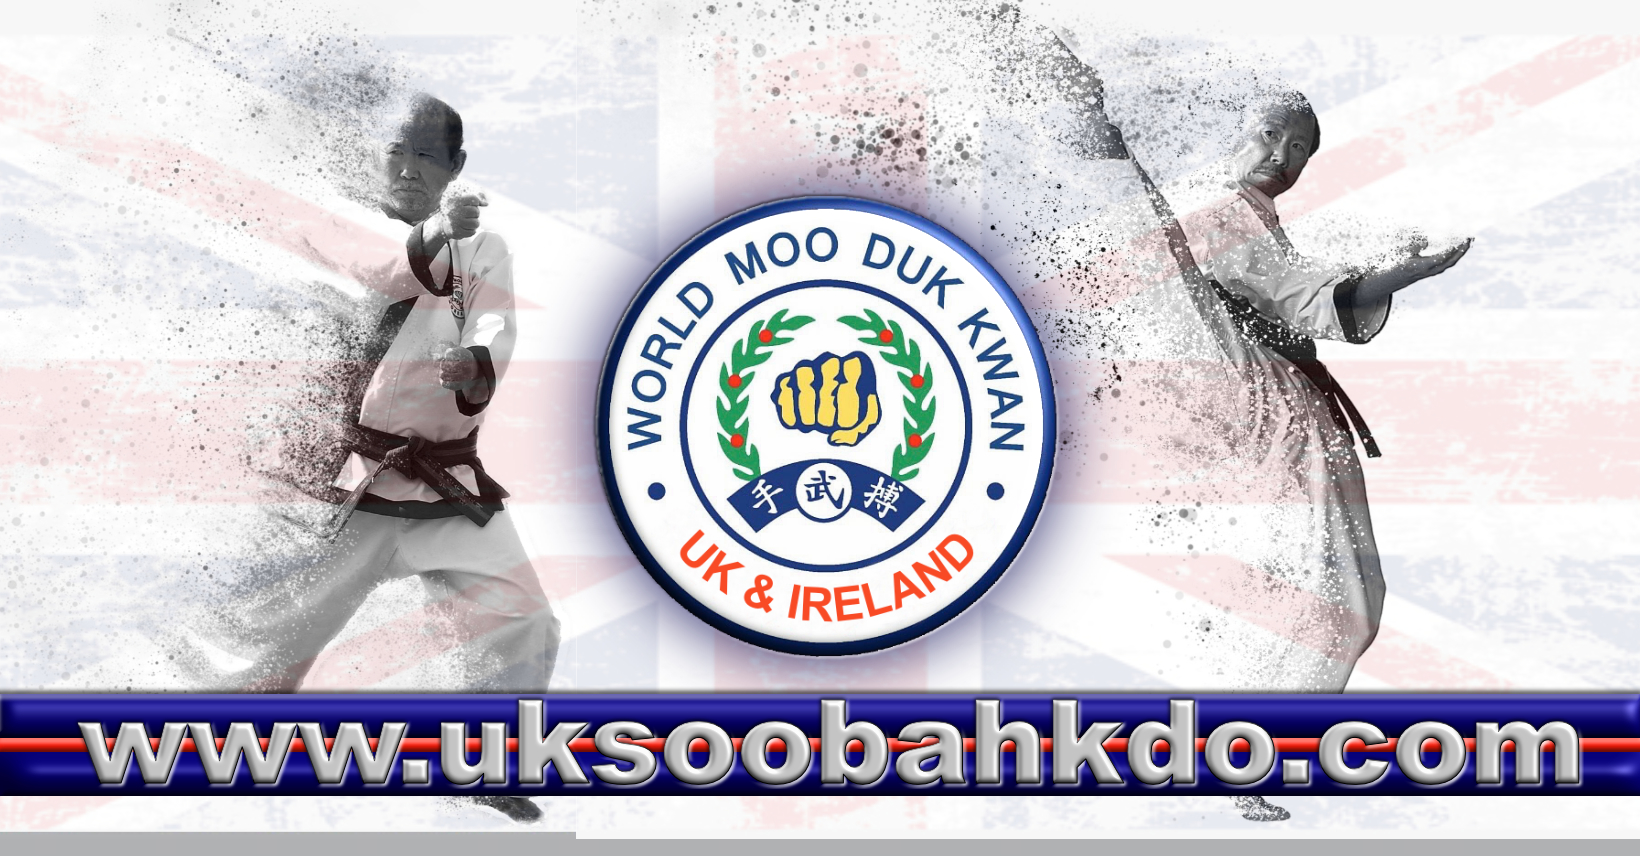 www.uksoobahkdo.com